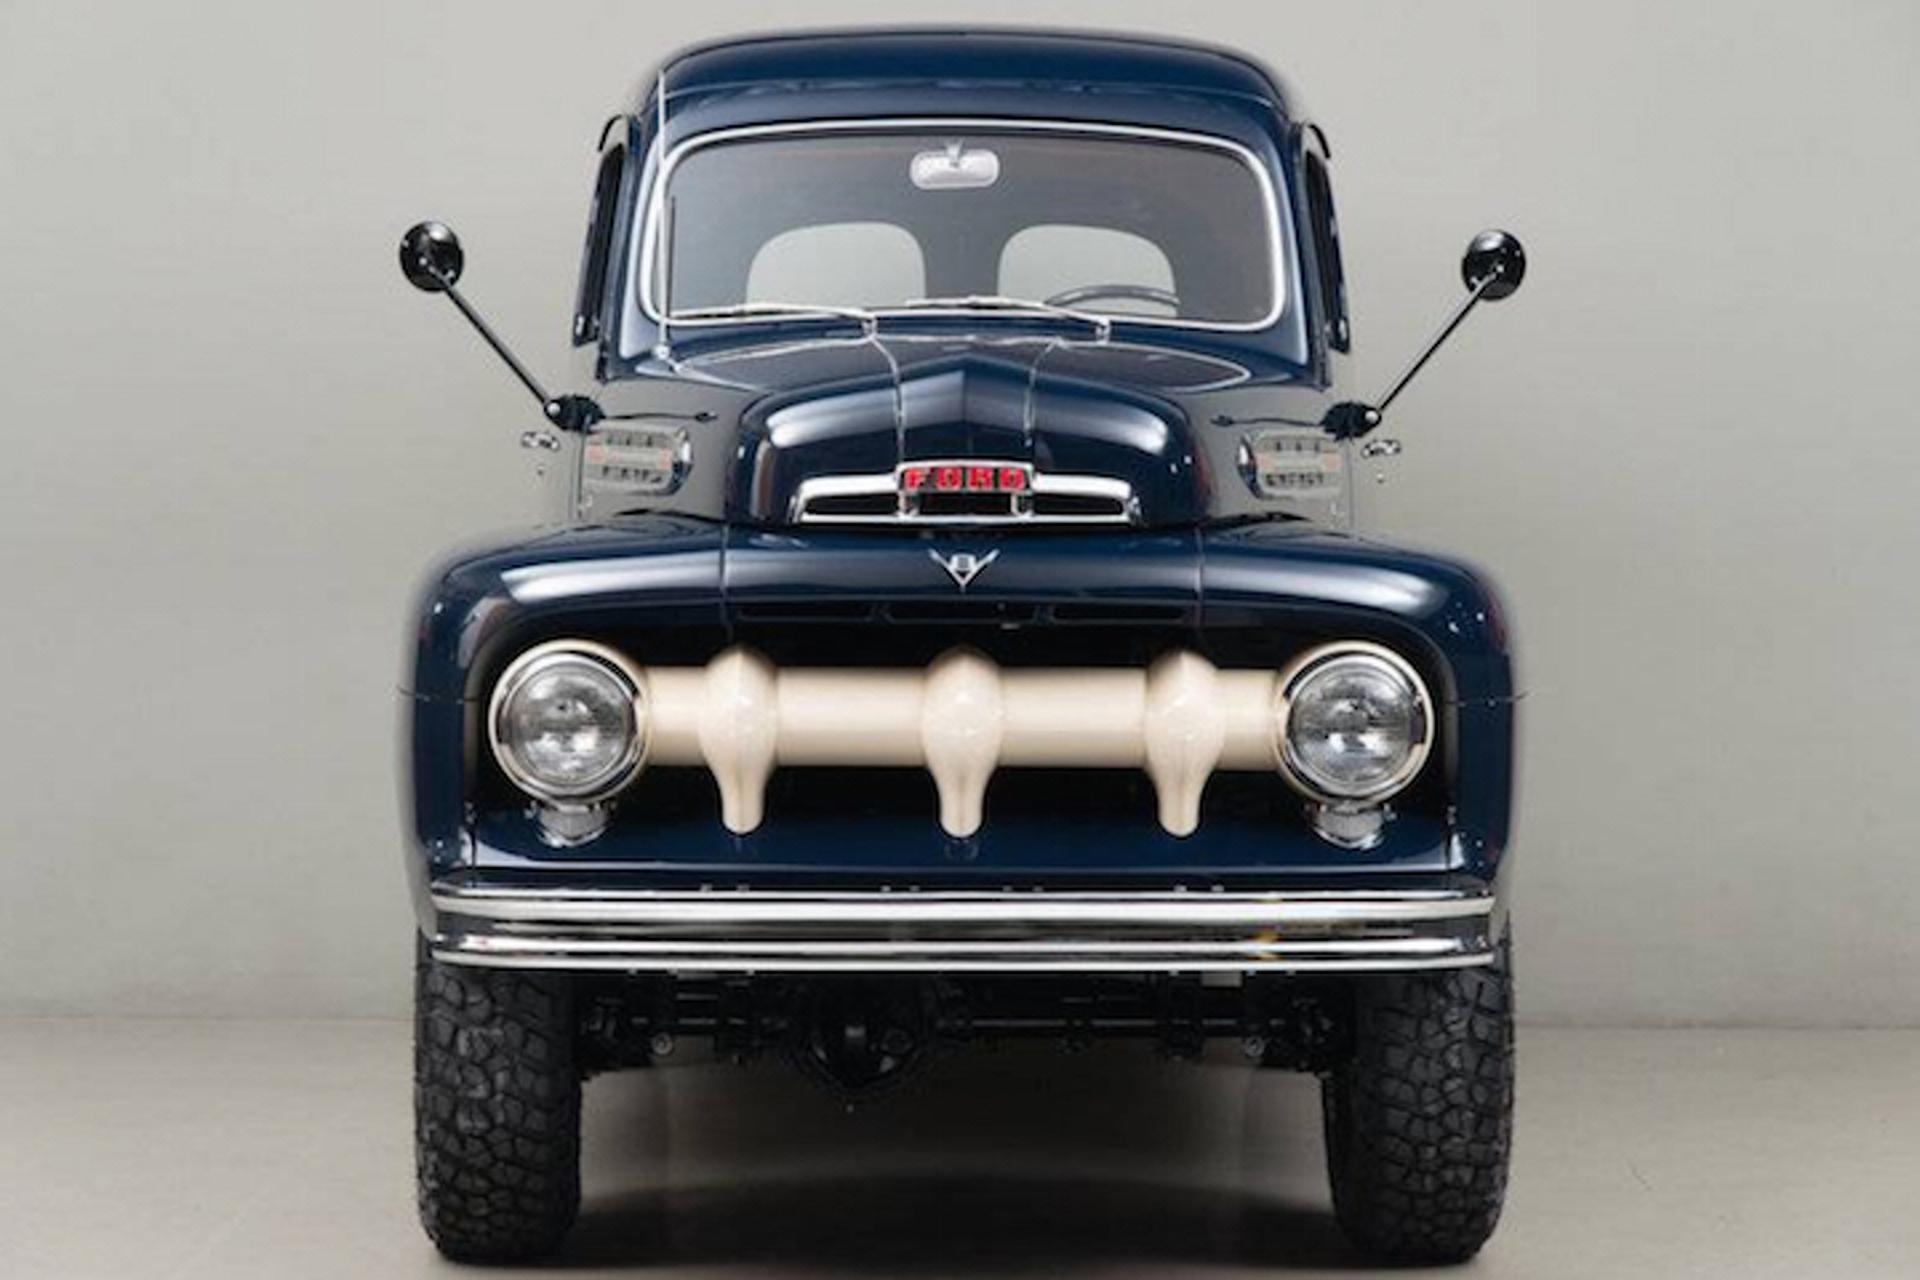 This 1951 Ford F1 Ranger Marmon-Herrington is Classic Adventuremobile Perfection